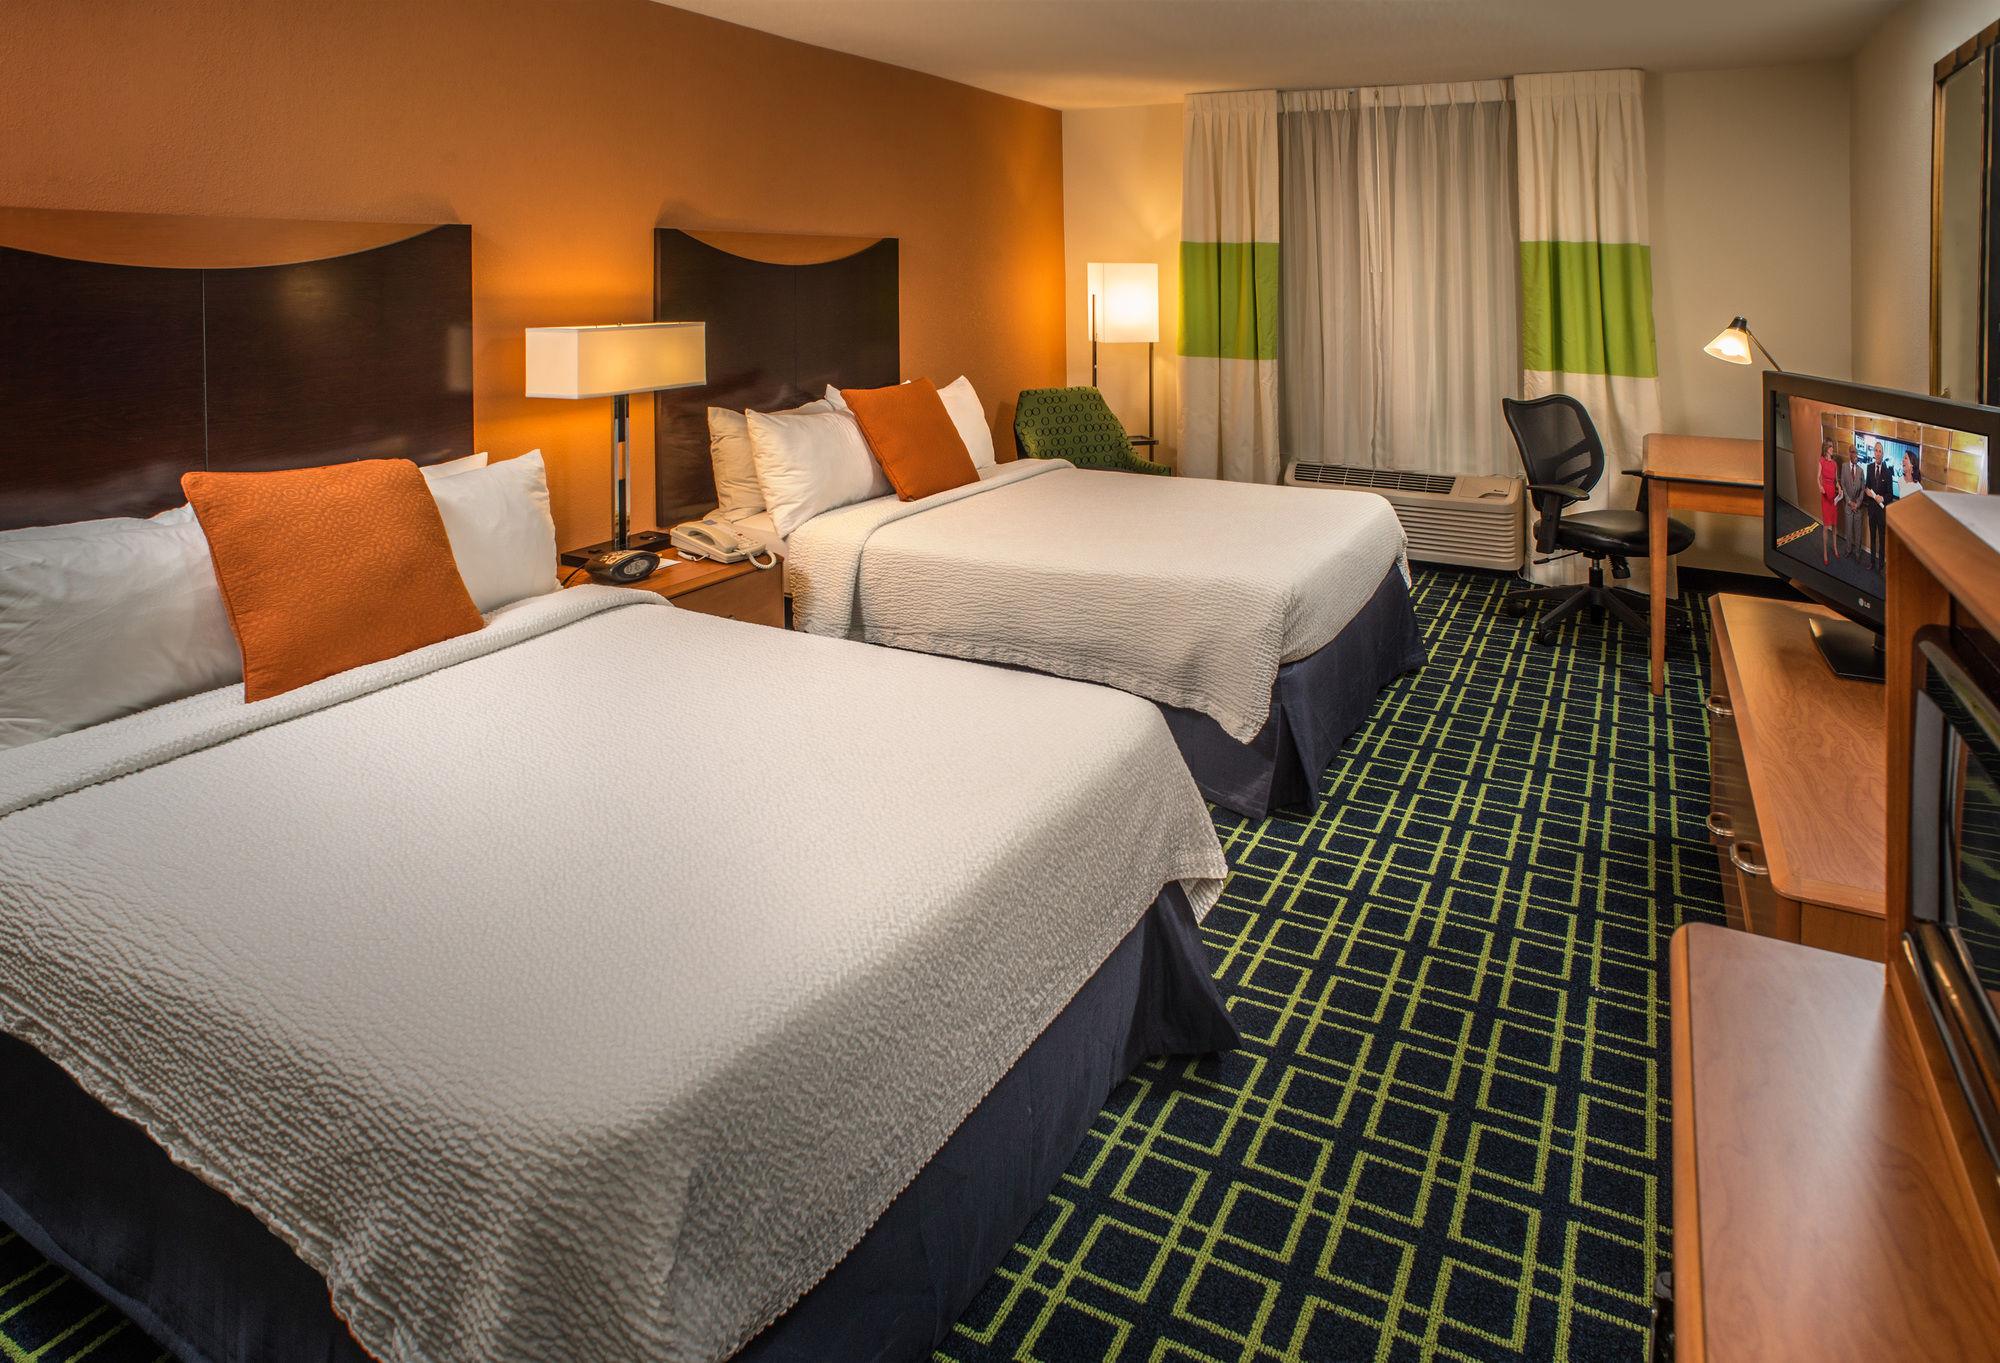 Fairfield Inn & Suites By Marriott Beckley